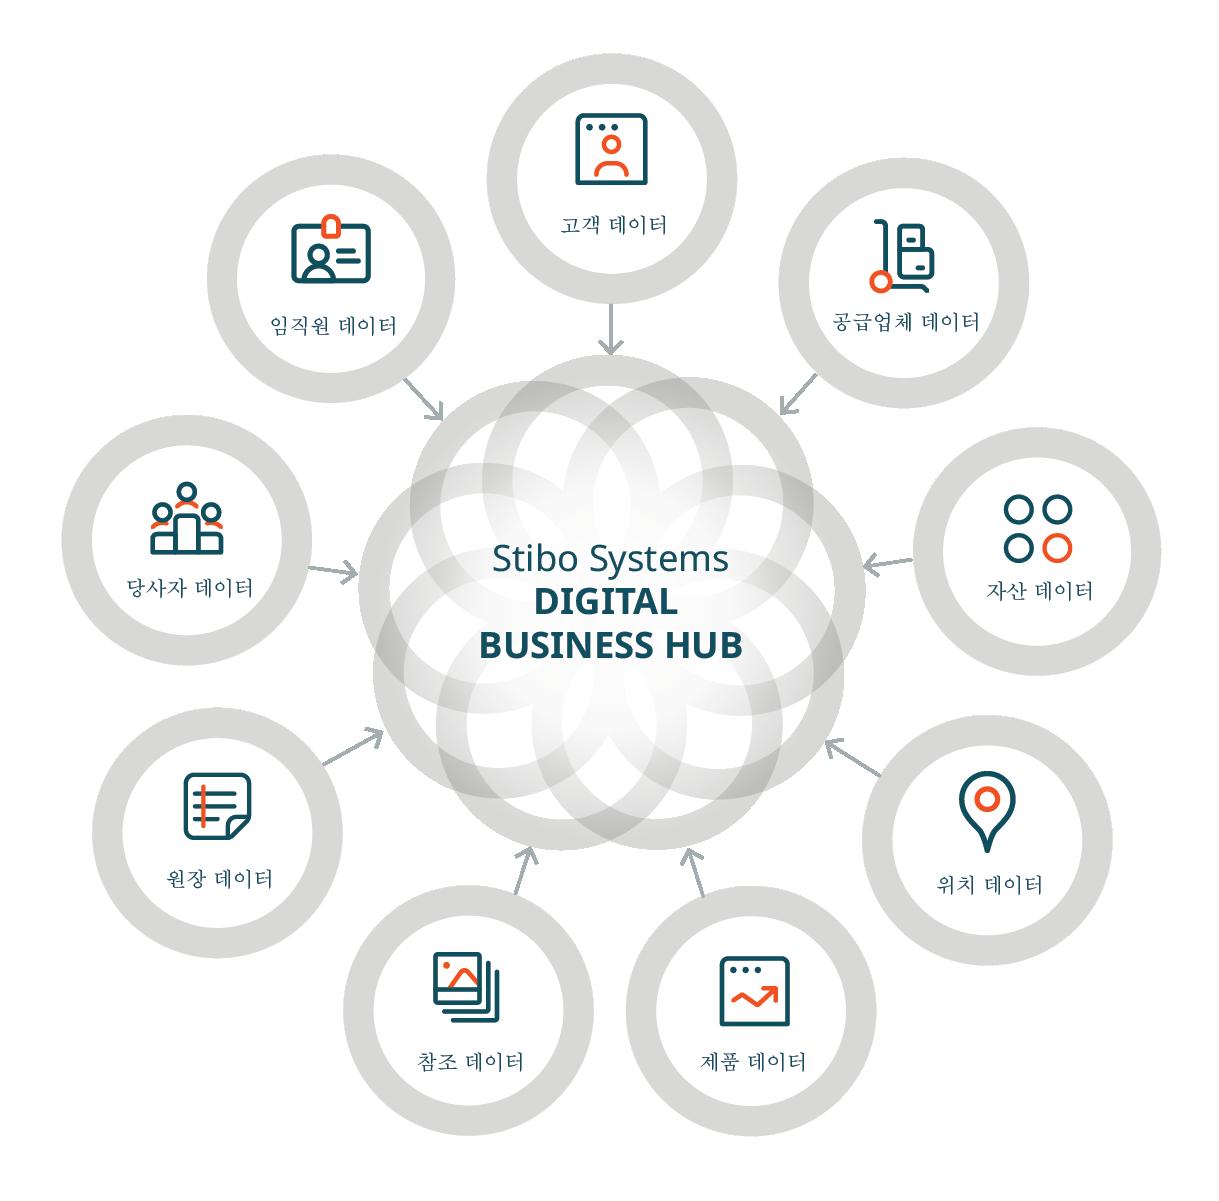 web_digital business hub domains_translations-KO